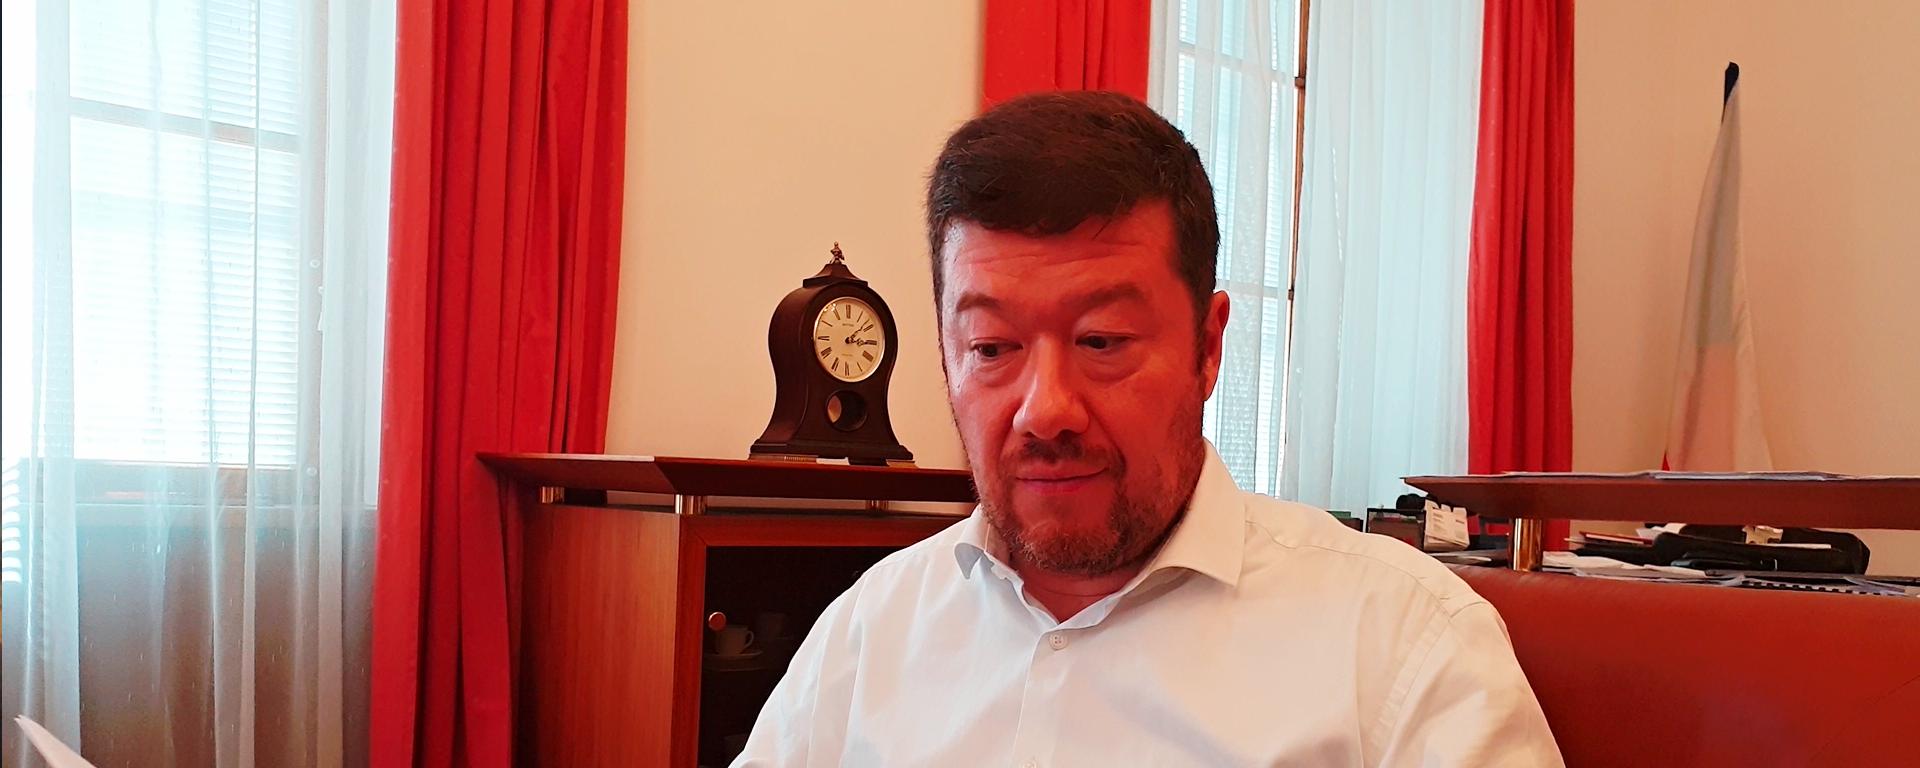 Tomio Okamura, předseda SPD - Sputnik Česká republika, 1920, 08.08.2021